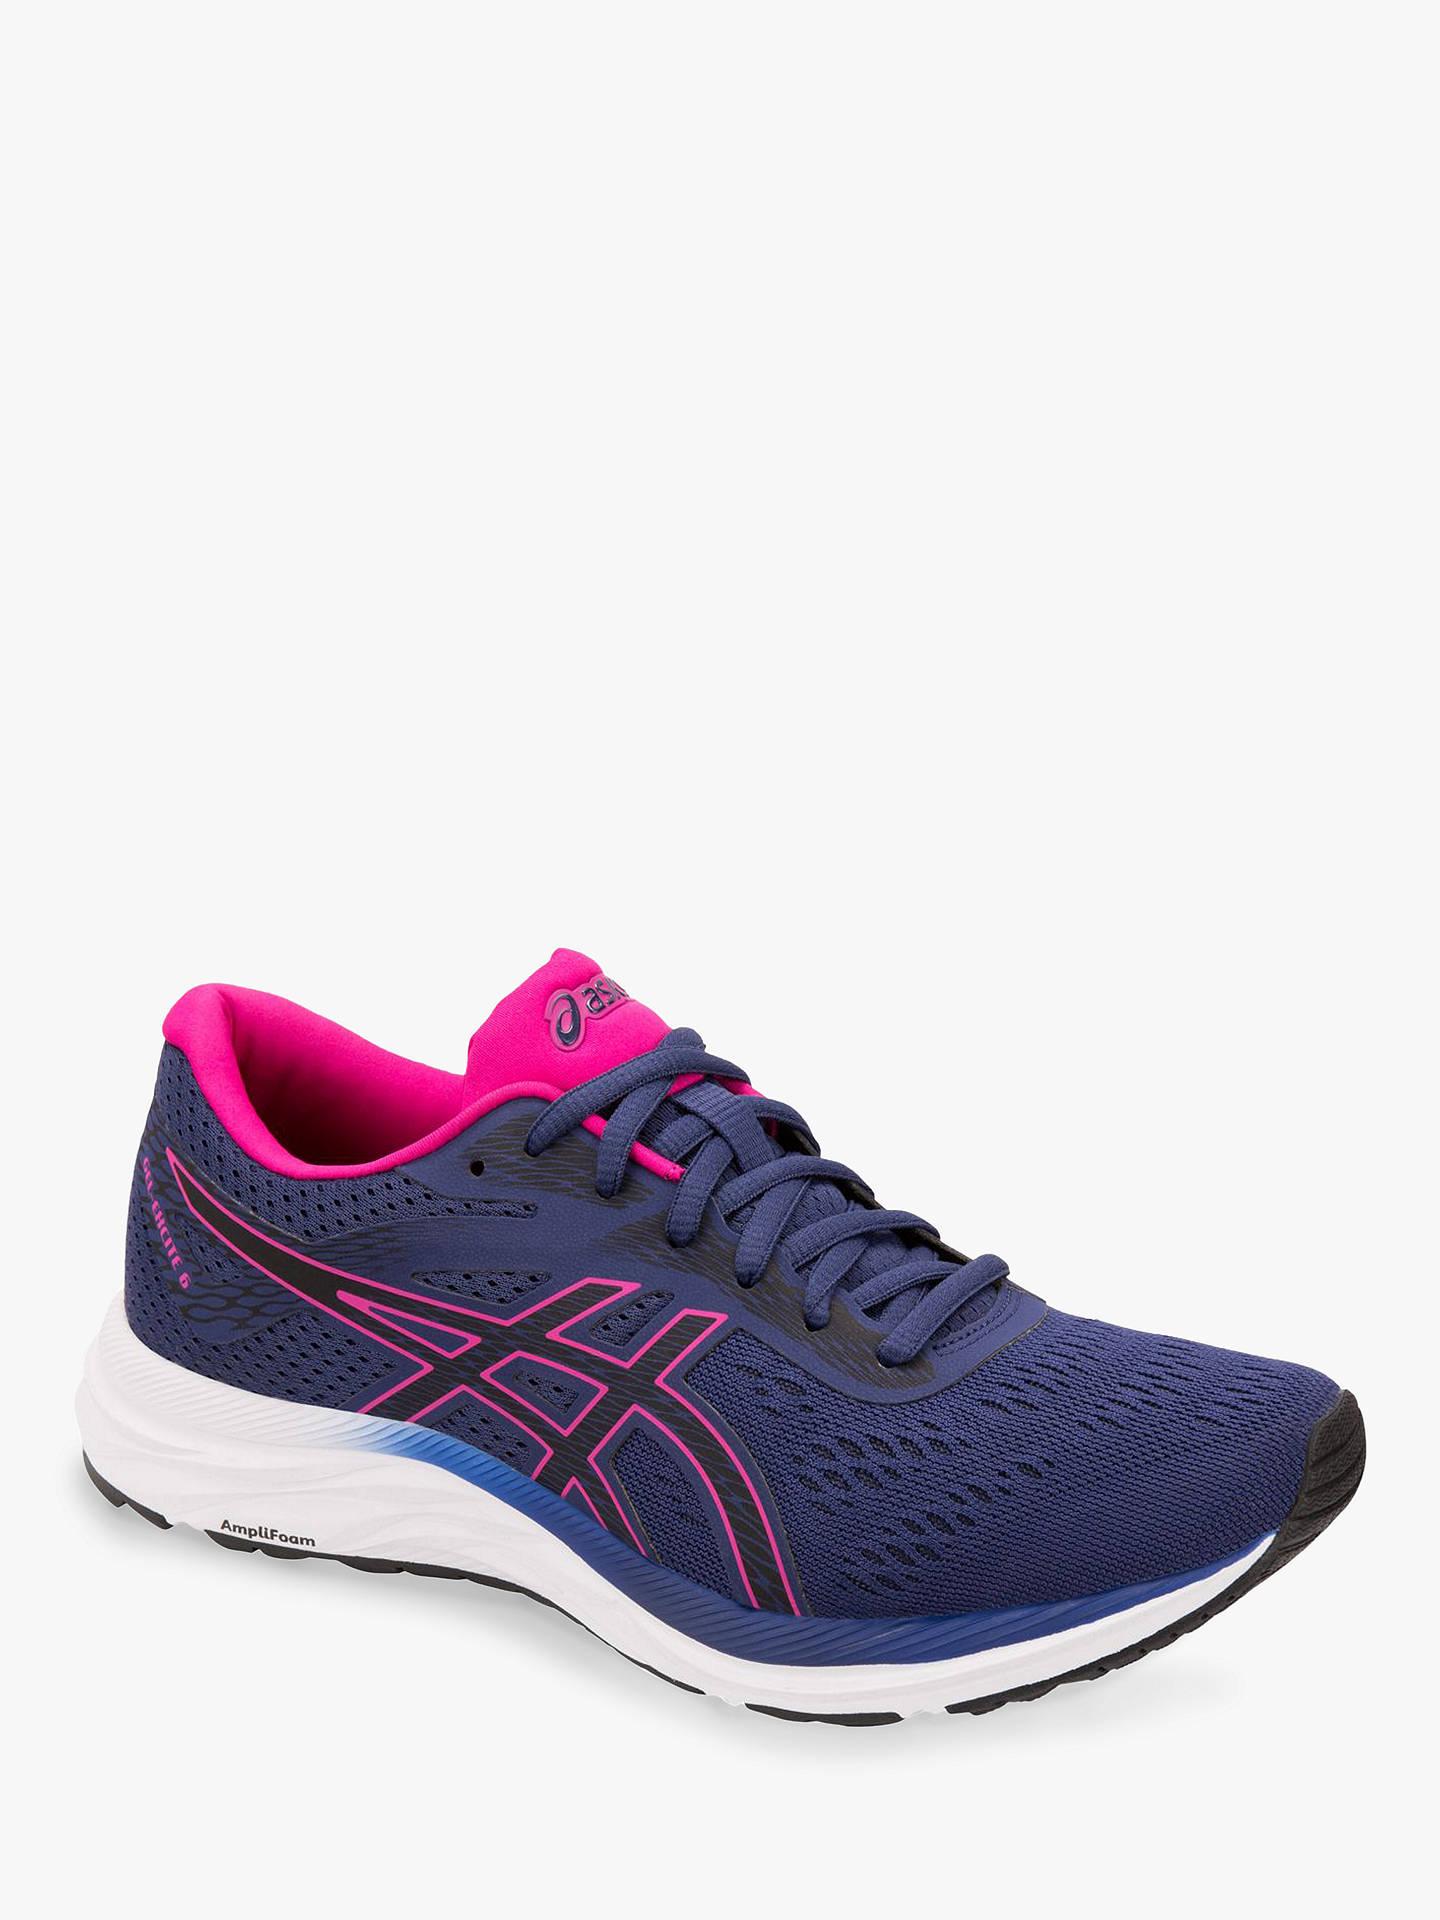 d1a4d1f8f04389 ... Buy ASICS GEL-EXCITE 6 Women's Running Shoes, Indigo Blue/Pink Rave, ...